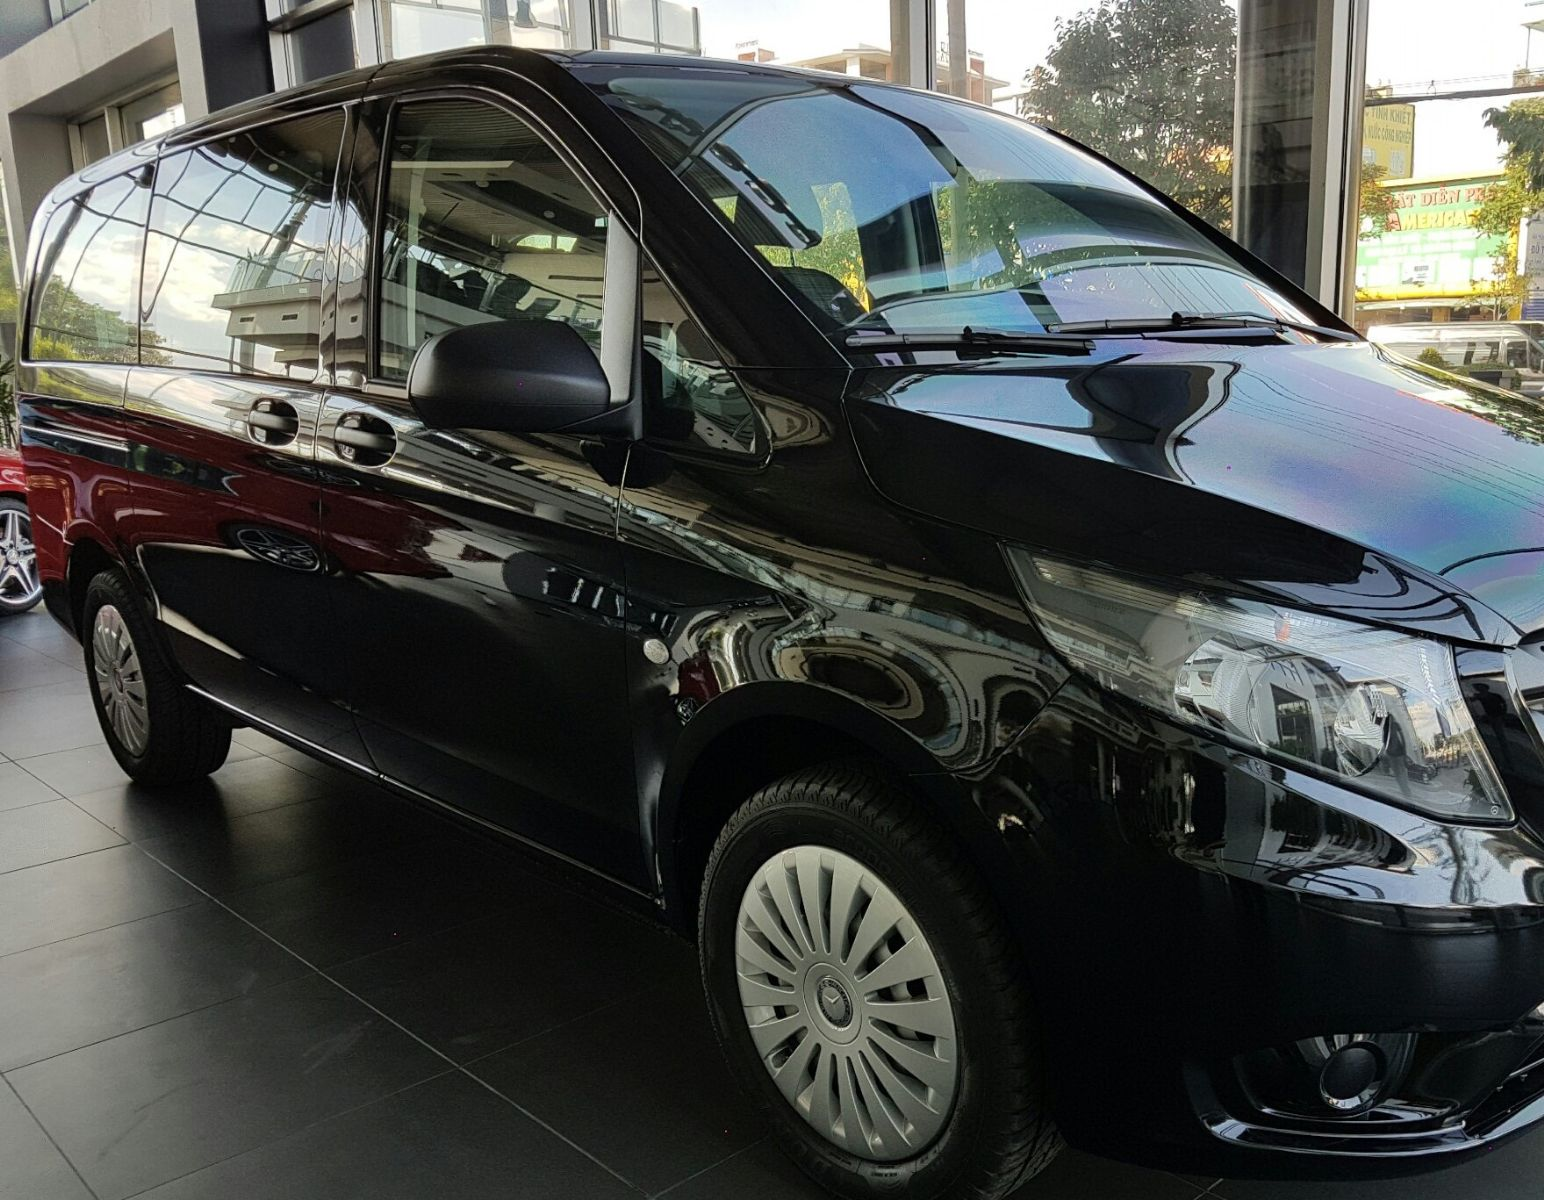 Ngoại thất Xe Mercedes Benz Vito Tourer 121 Máy Xăng màu đen 02